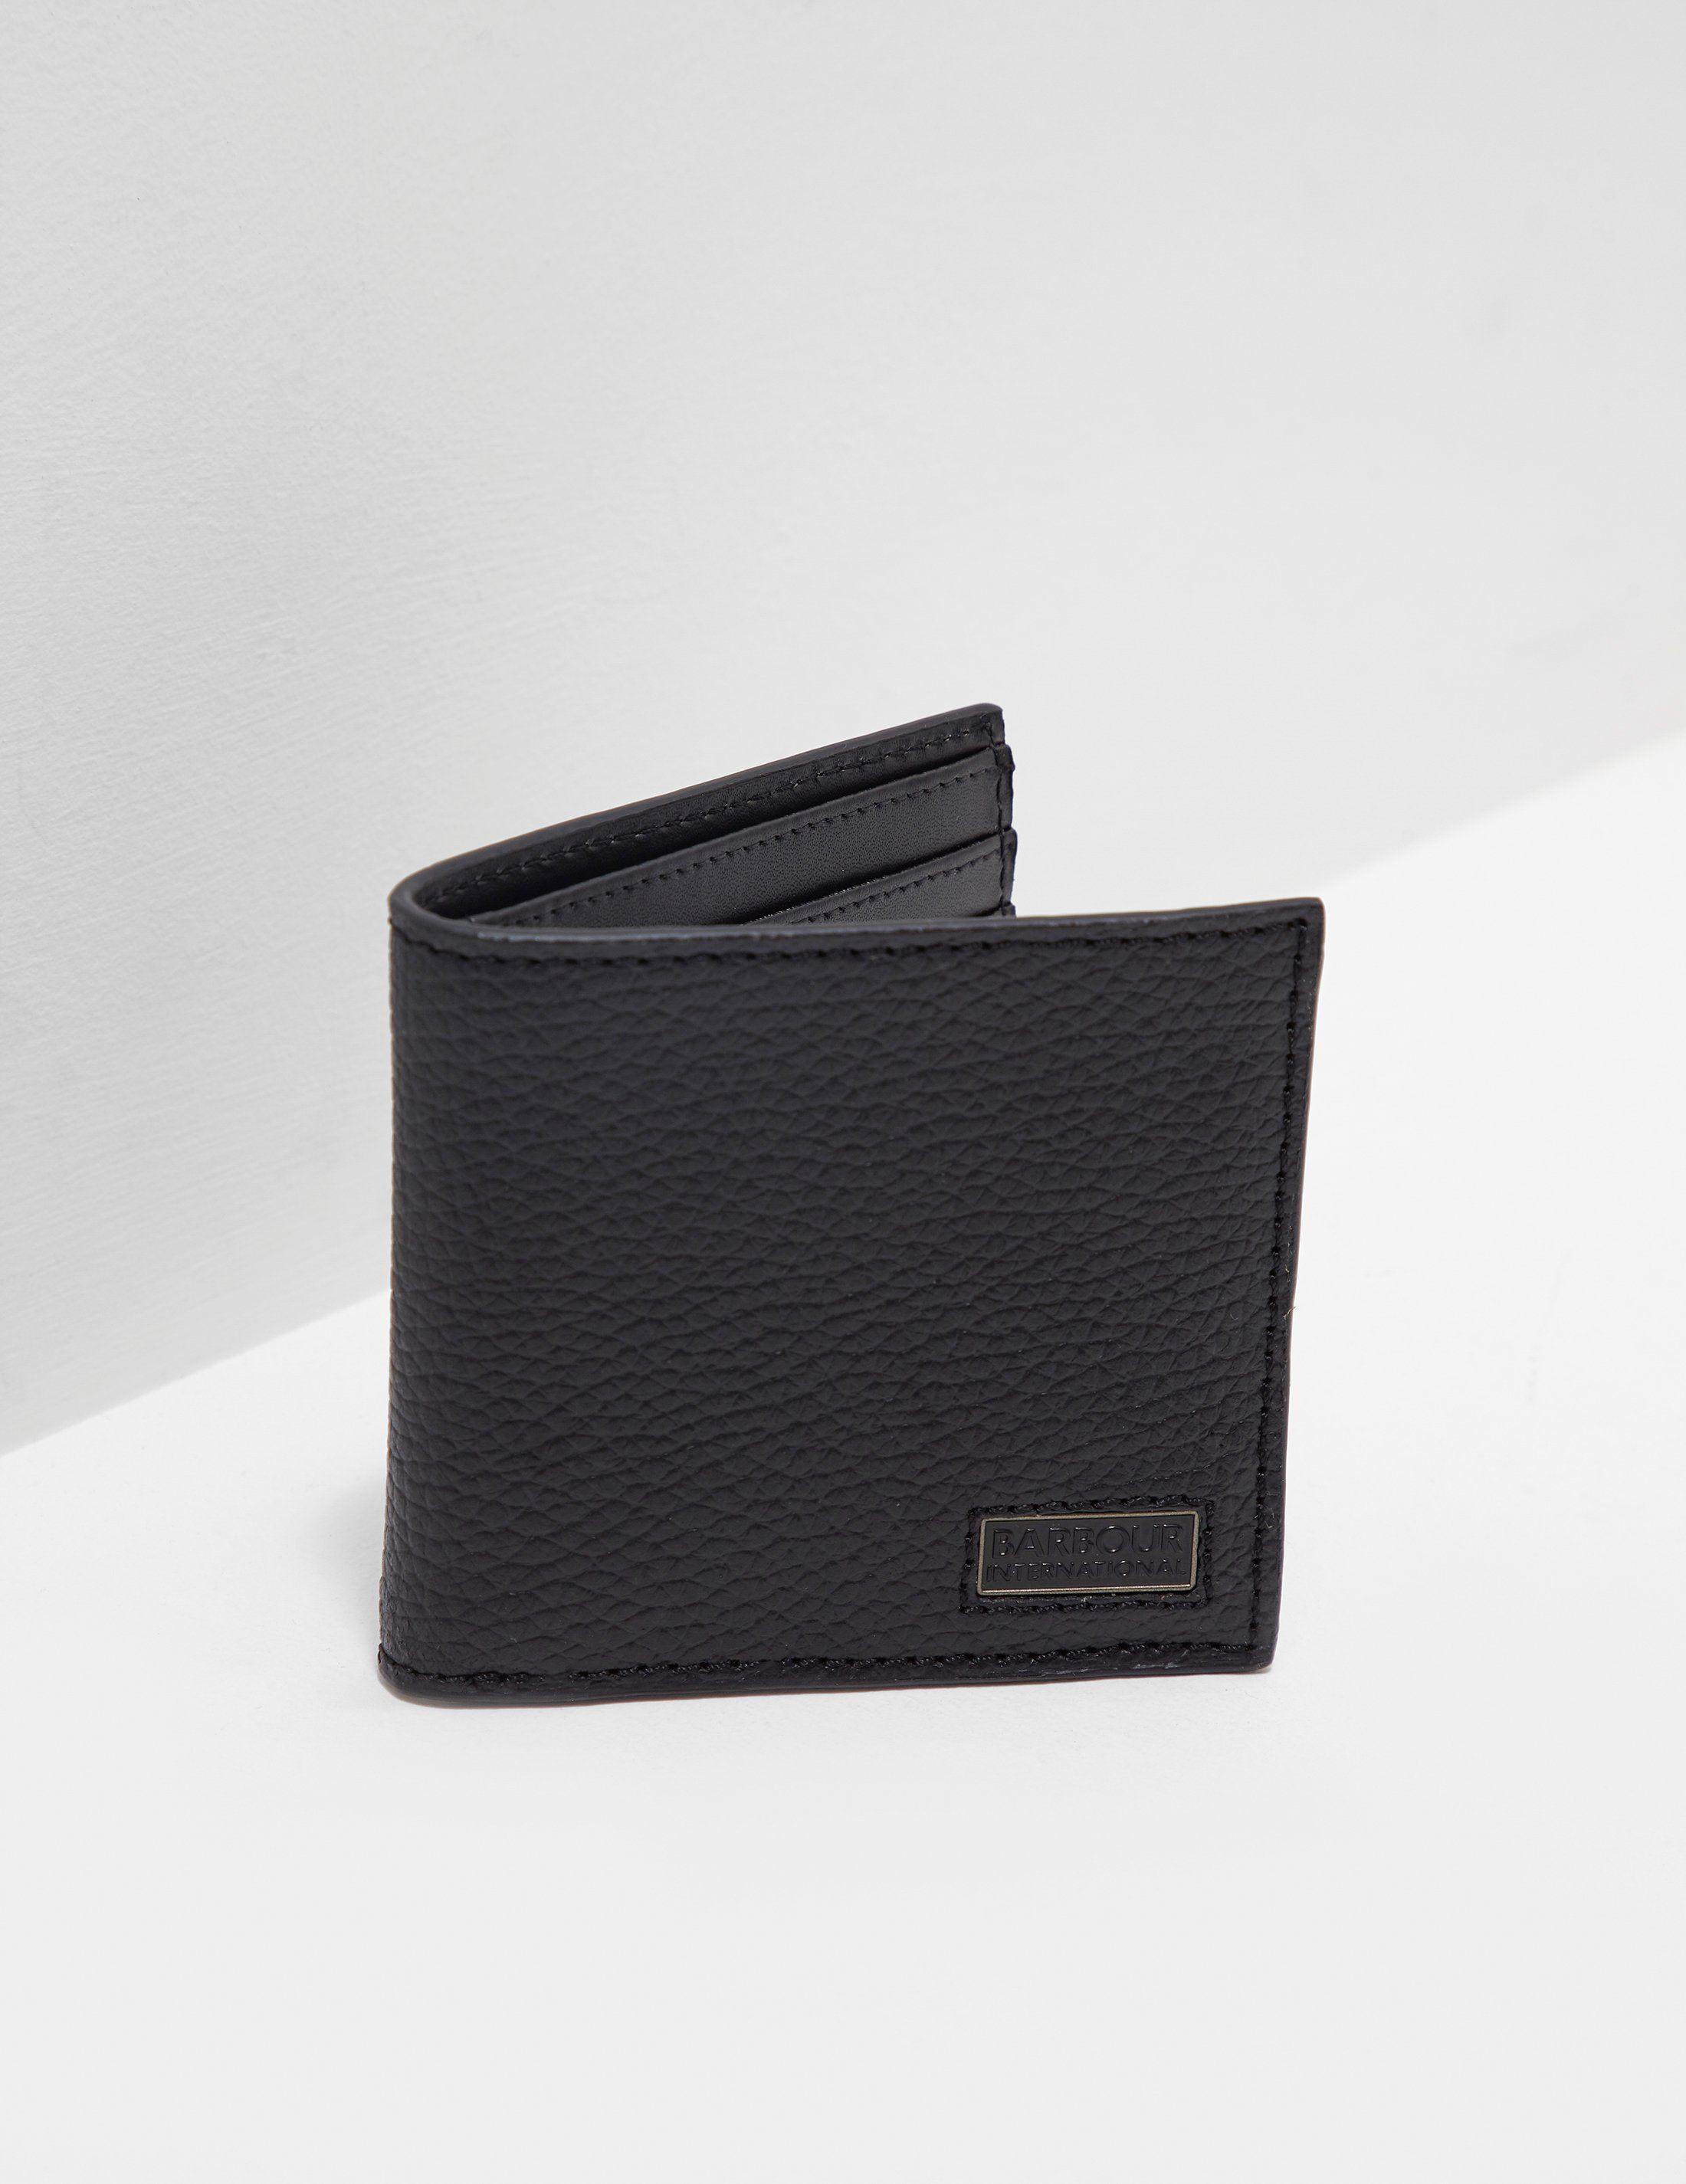 Barbour International Billfold Wallet